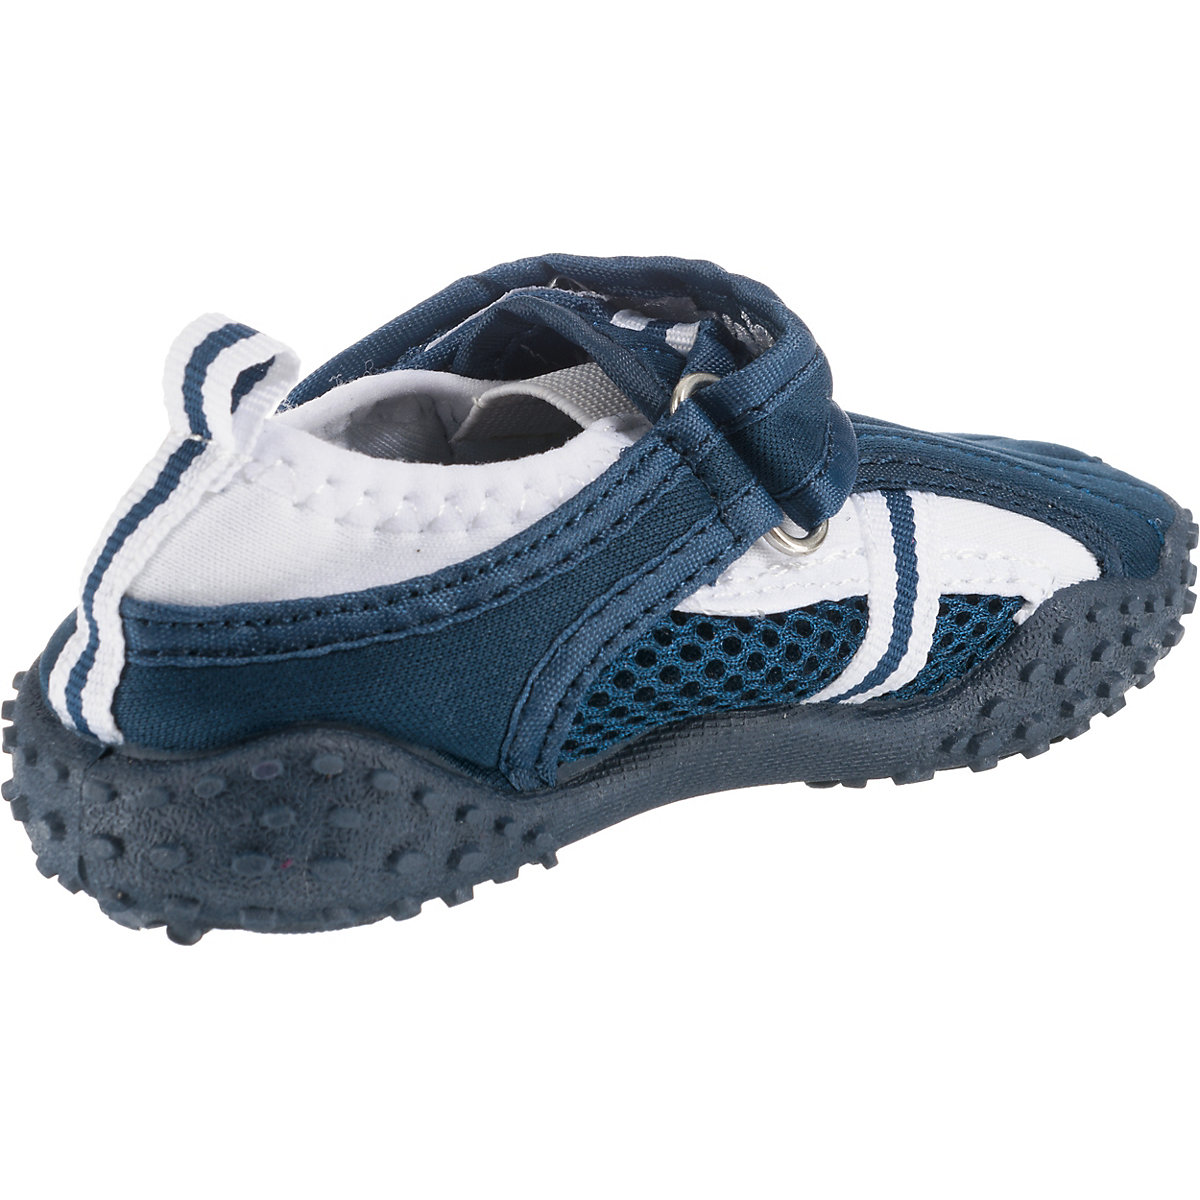 Playshoes, Kinder Aquaschuhe Mit Uv-schutz, Dunkelblau